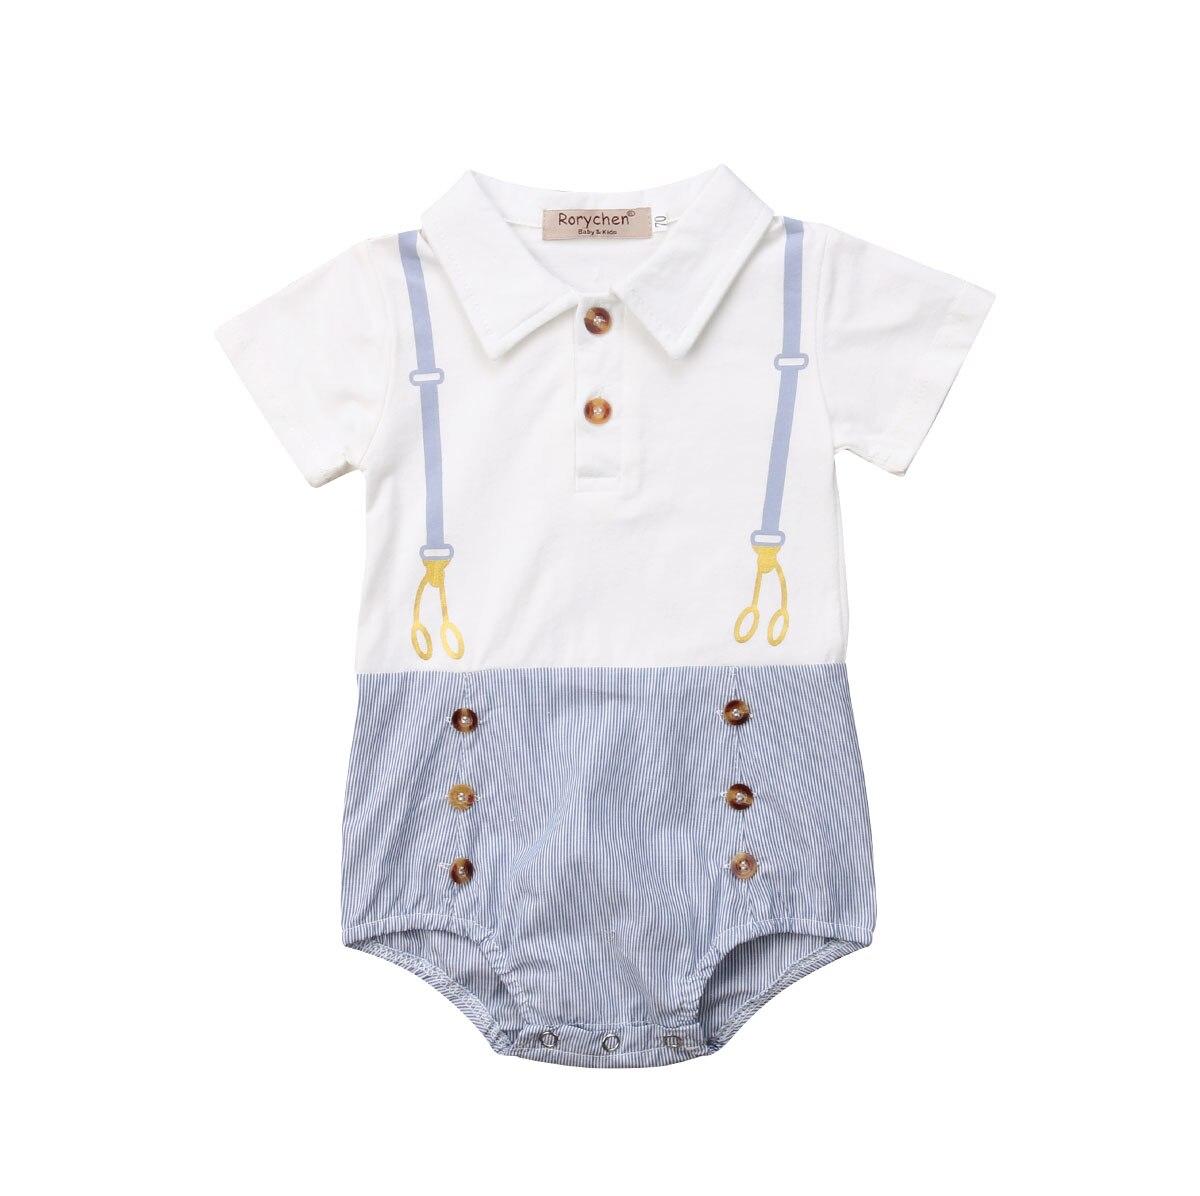 Cute Newborn Toddler Baby Boys Gentleman Romper Short Sleeve Infant Baby Boys Jumpsuit Baby Boys Clothing